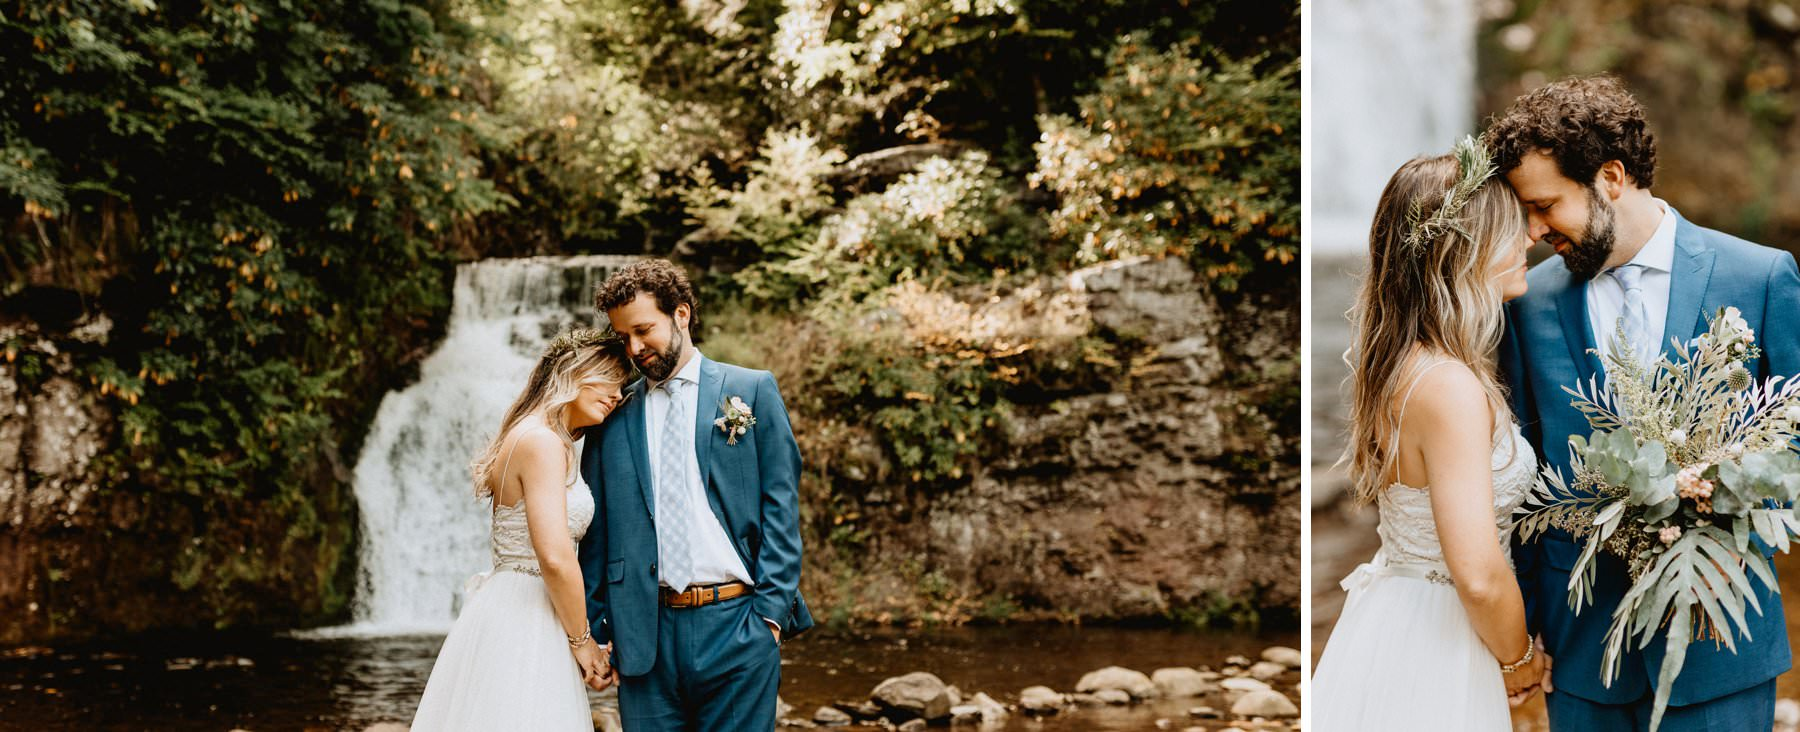 026-Tall-timber-barn-wedding-27.jpg